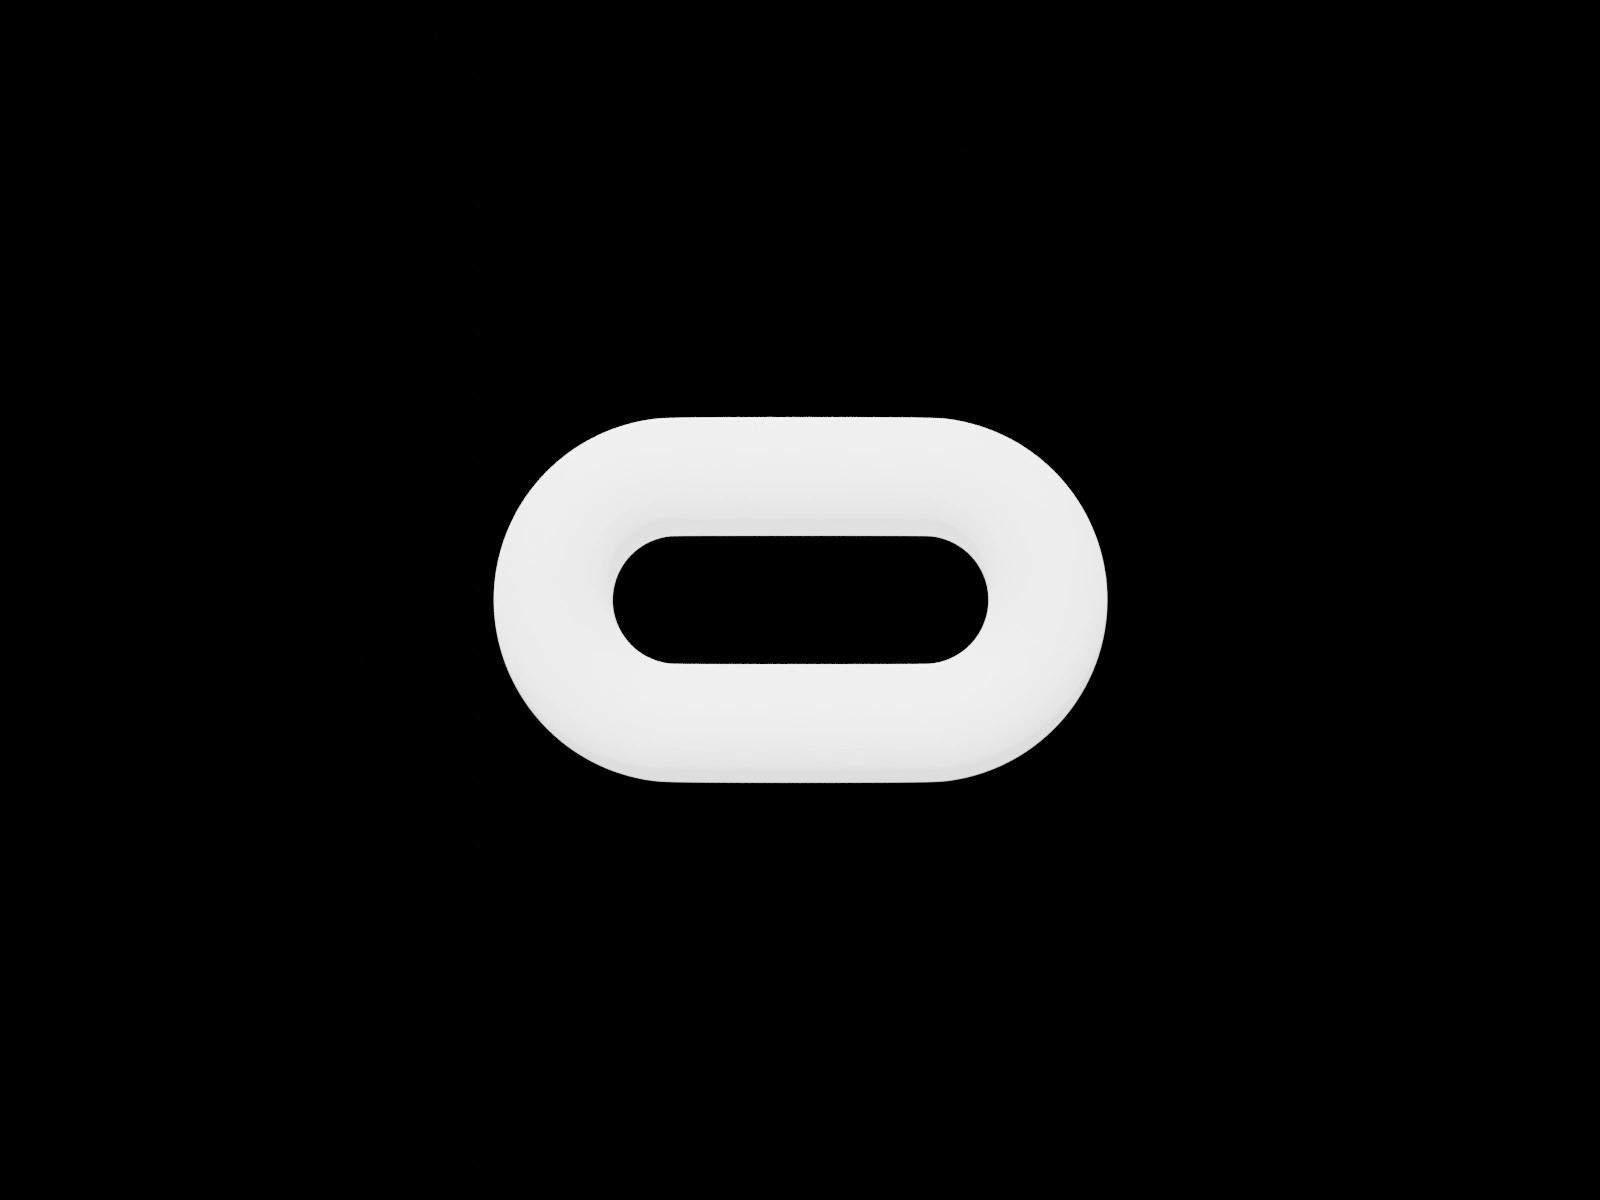 Oculus Logo Animation By Oleg Frolov Animation Oculus Logos